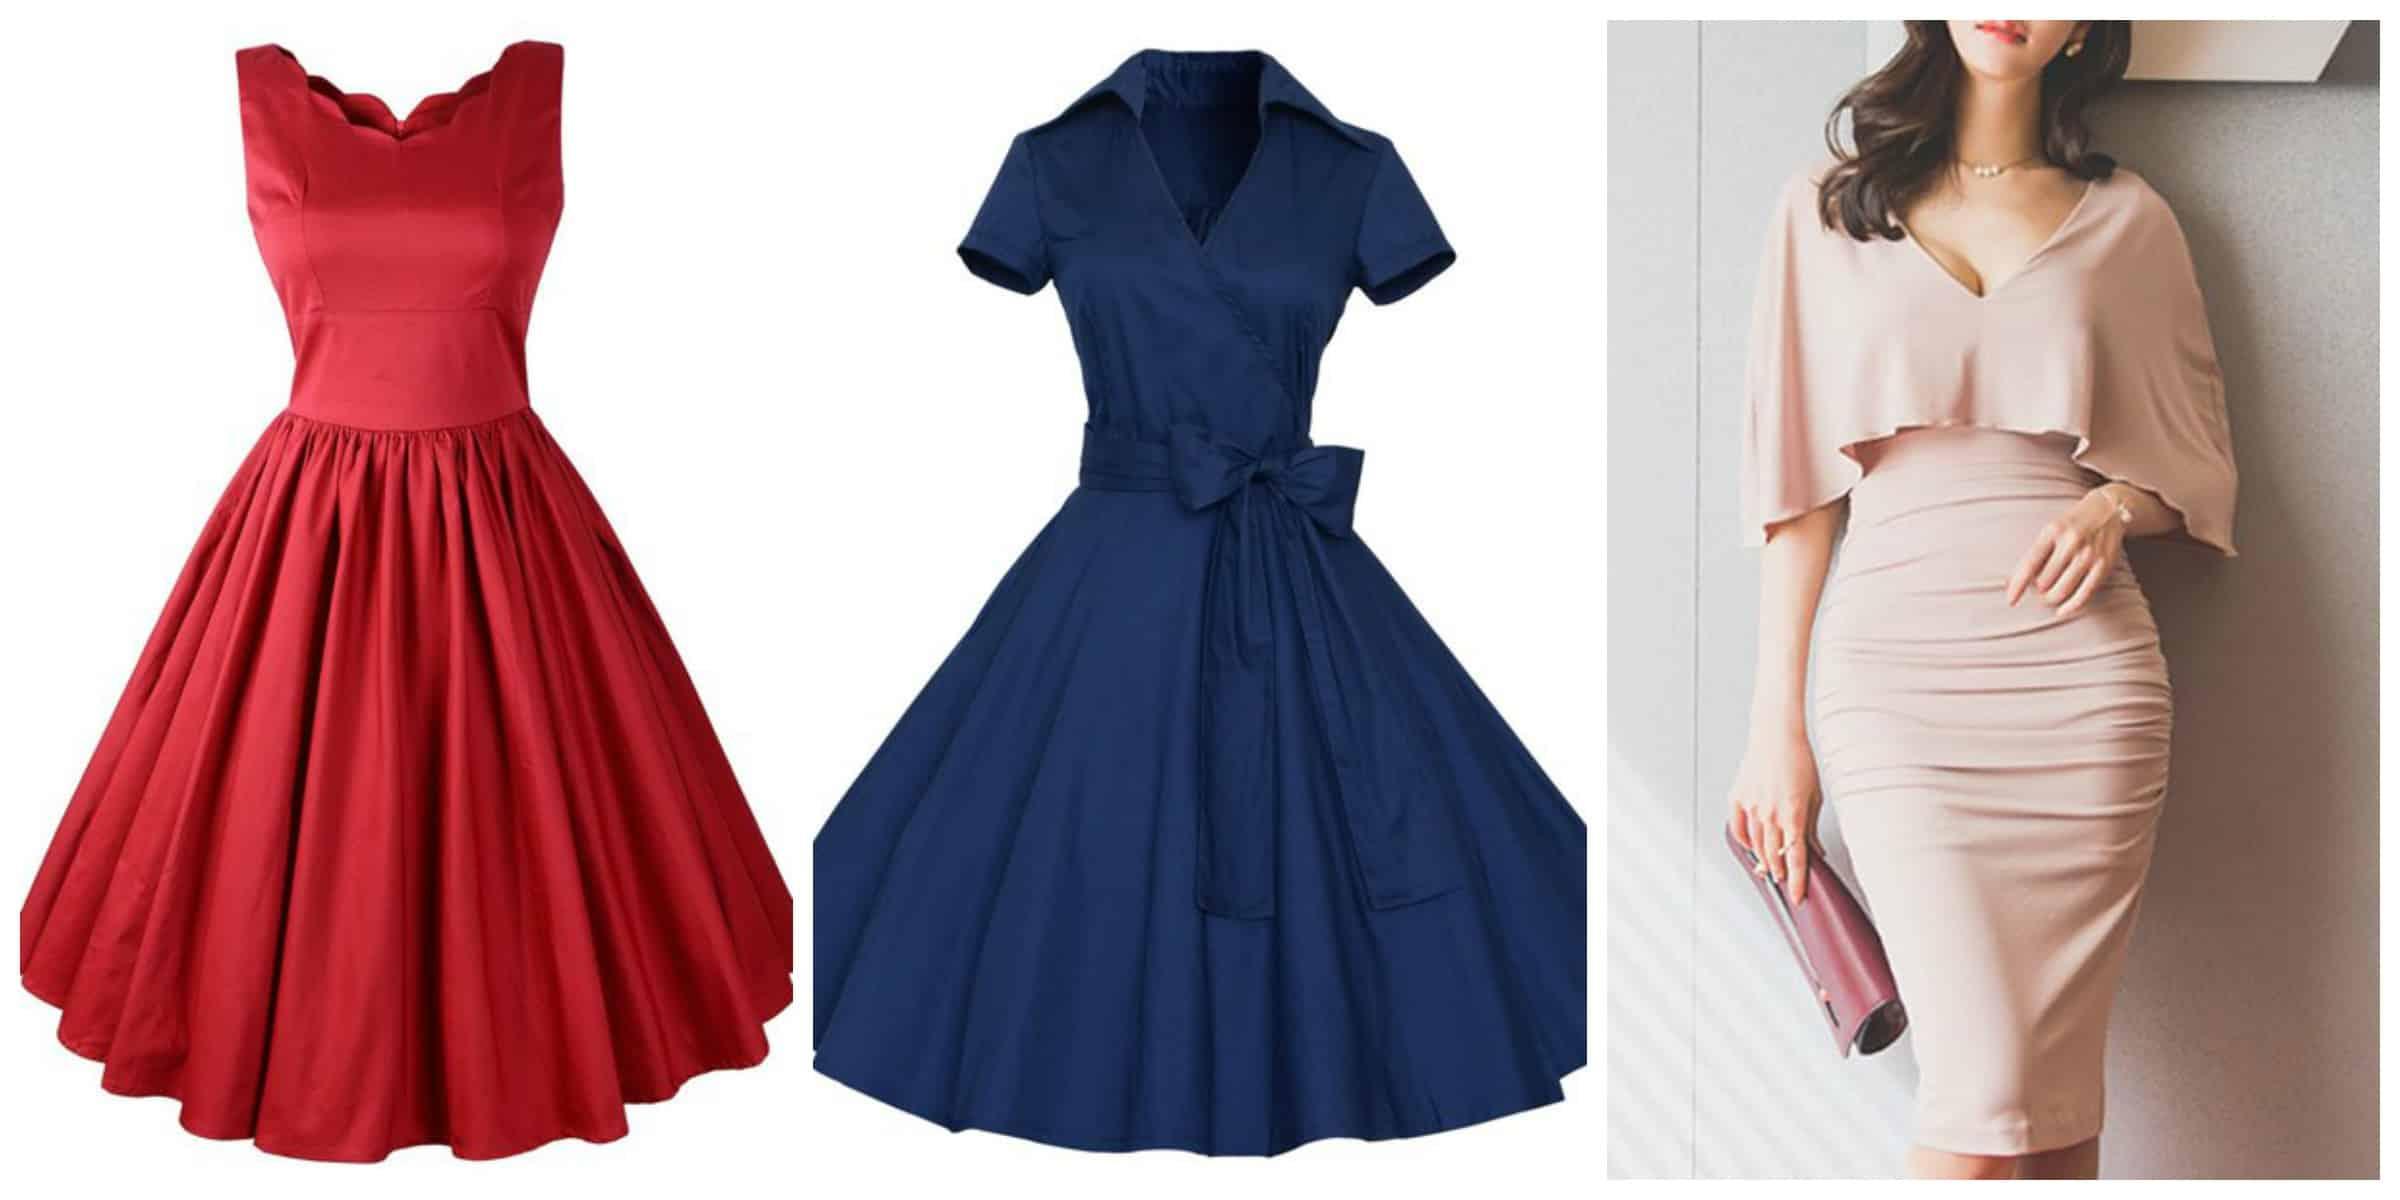 retro-dresses